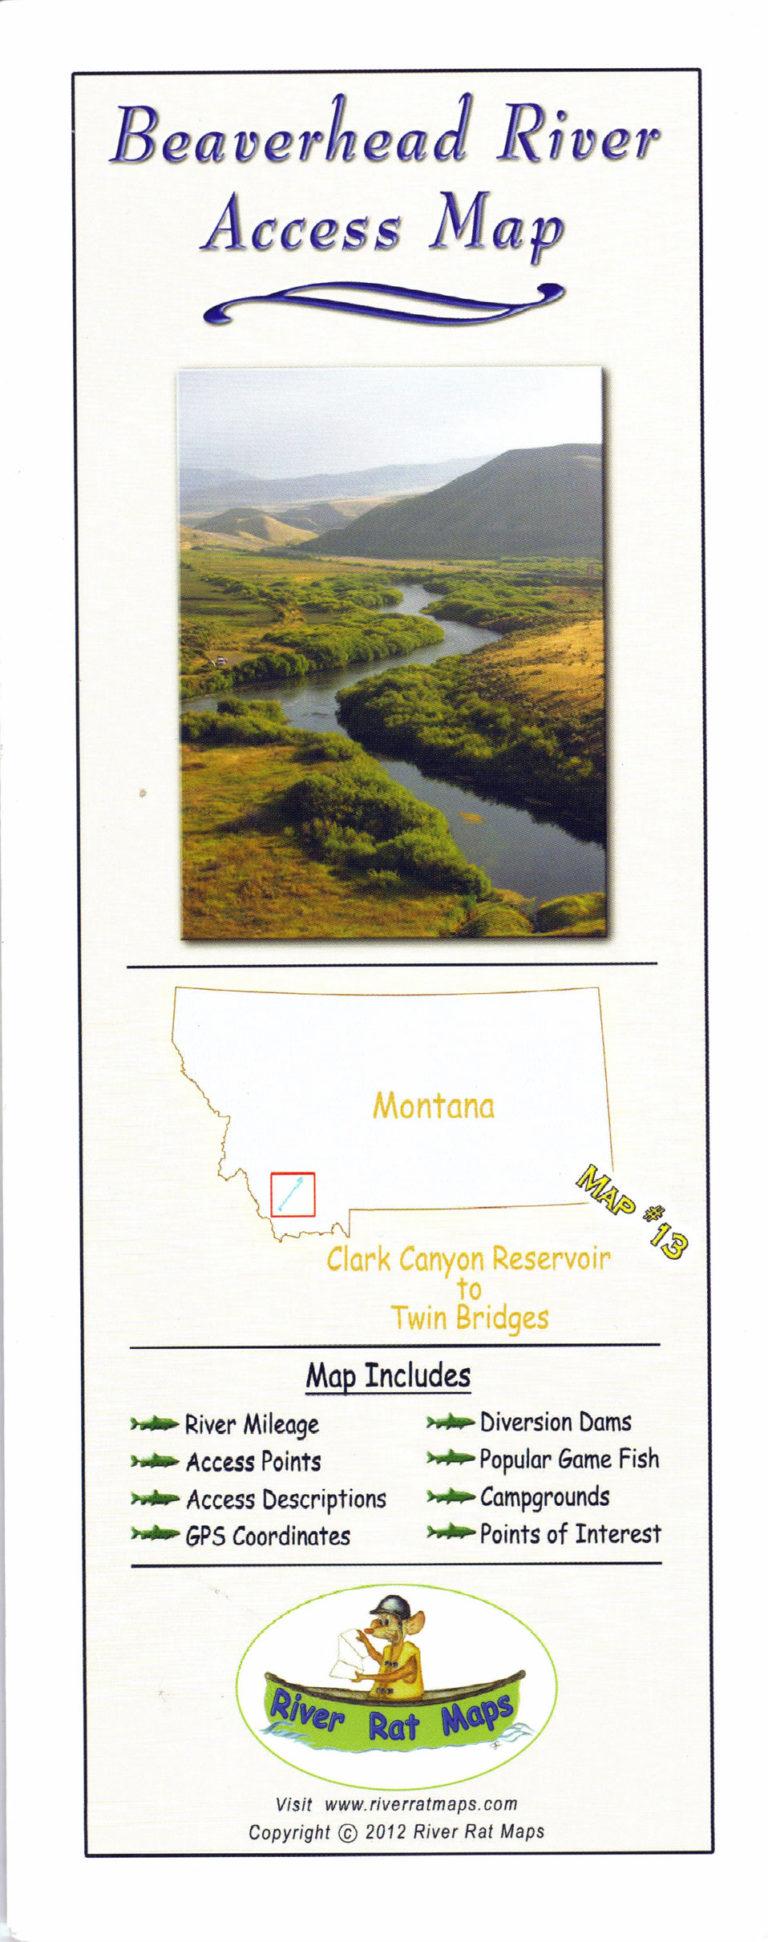 Beaverhead River Map by River Rat Maps